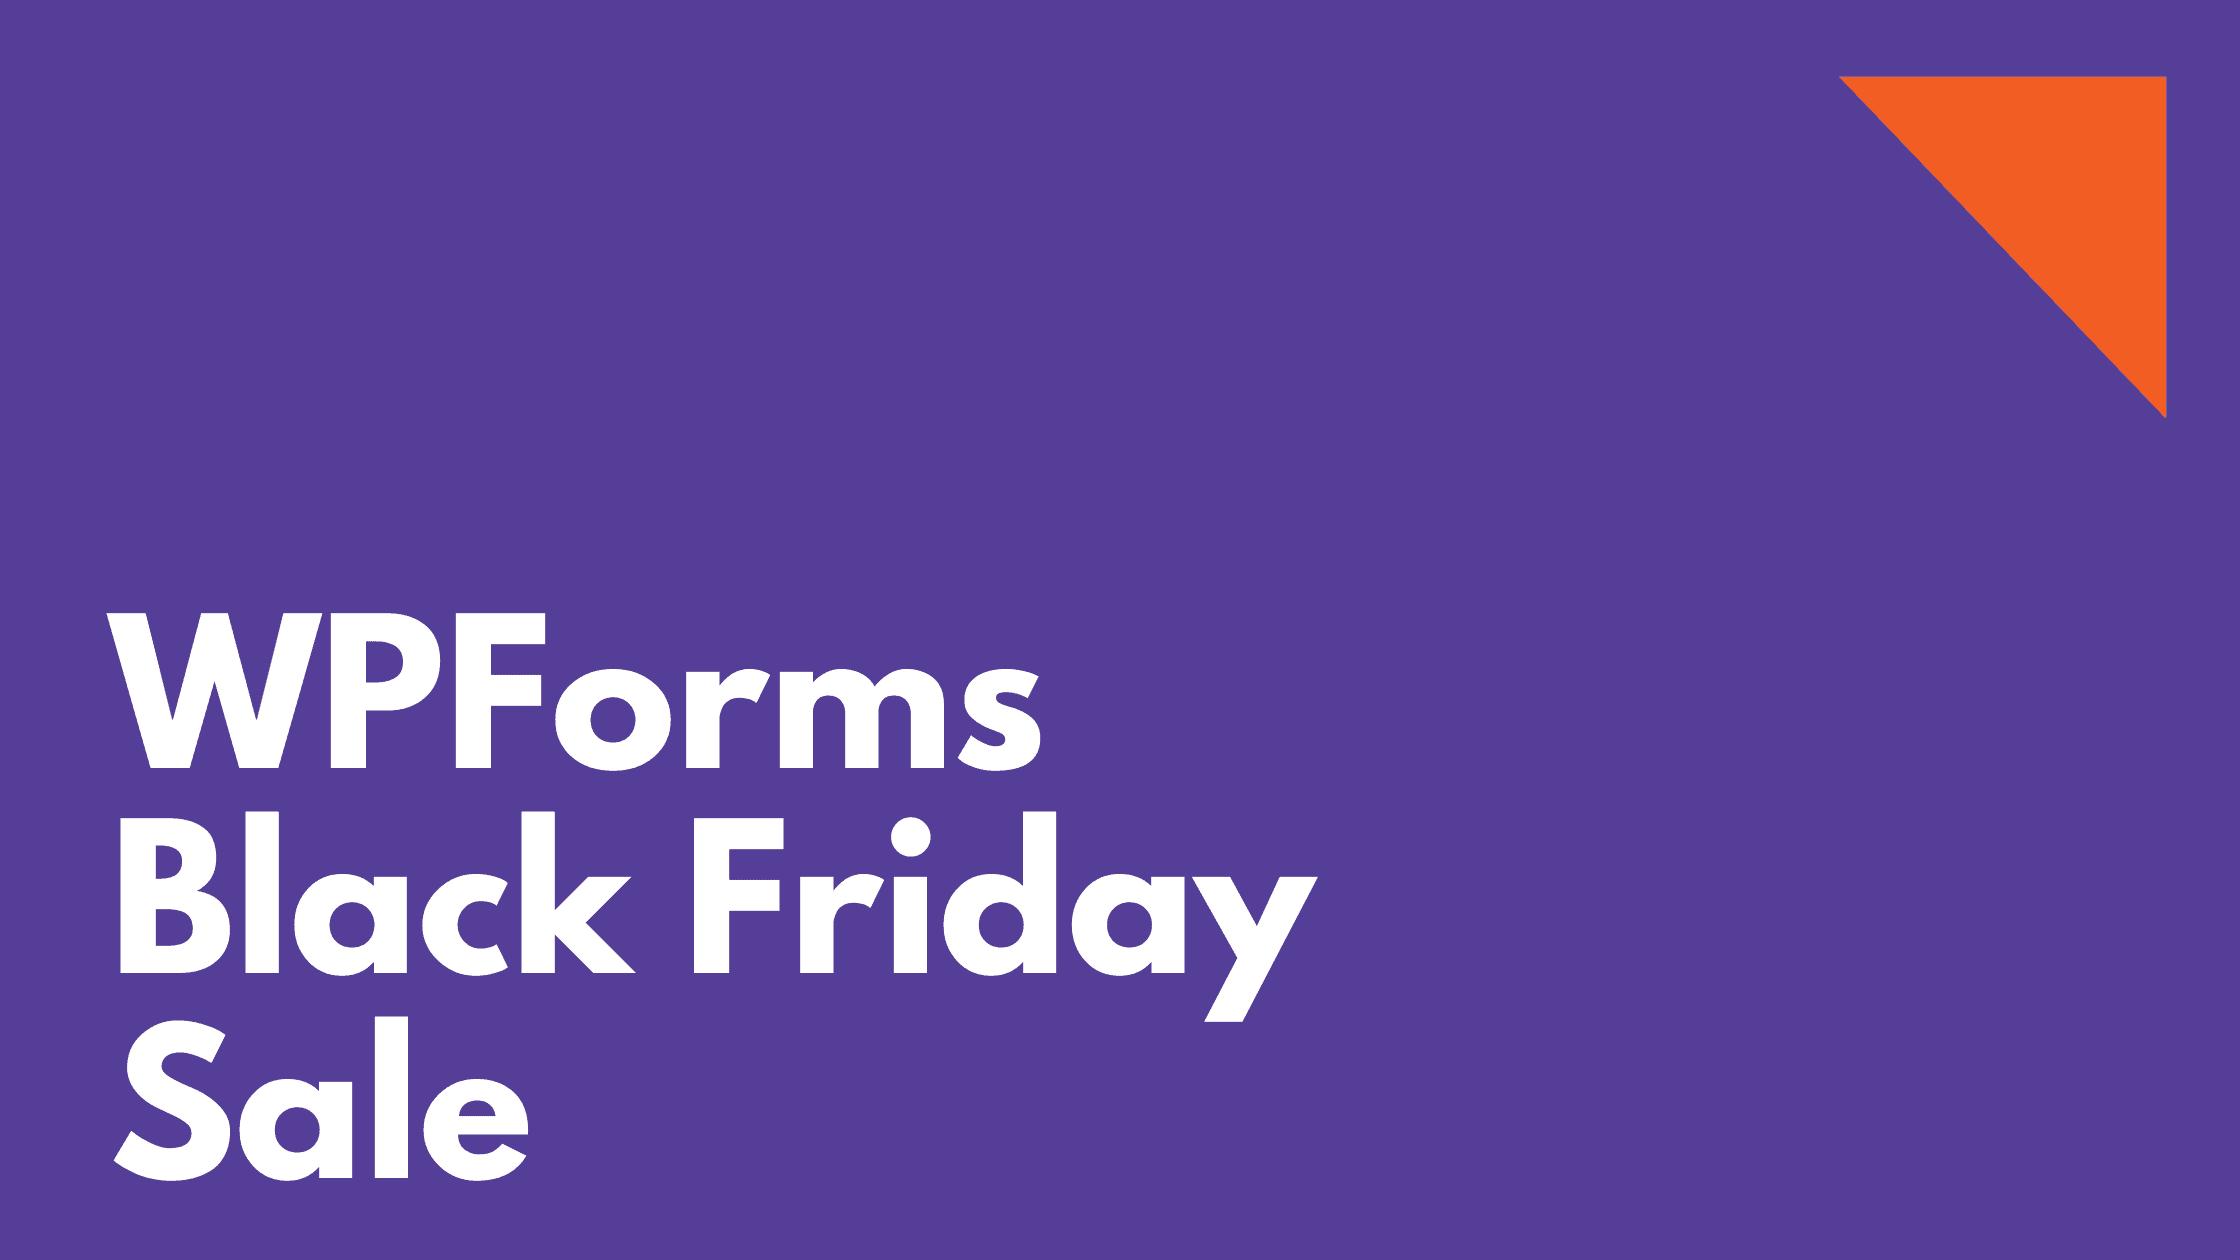 WPForms Black Friday